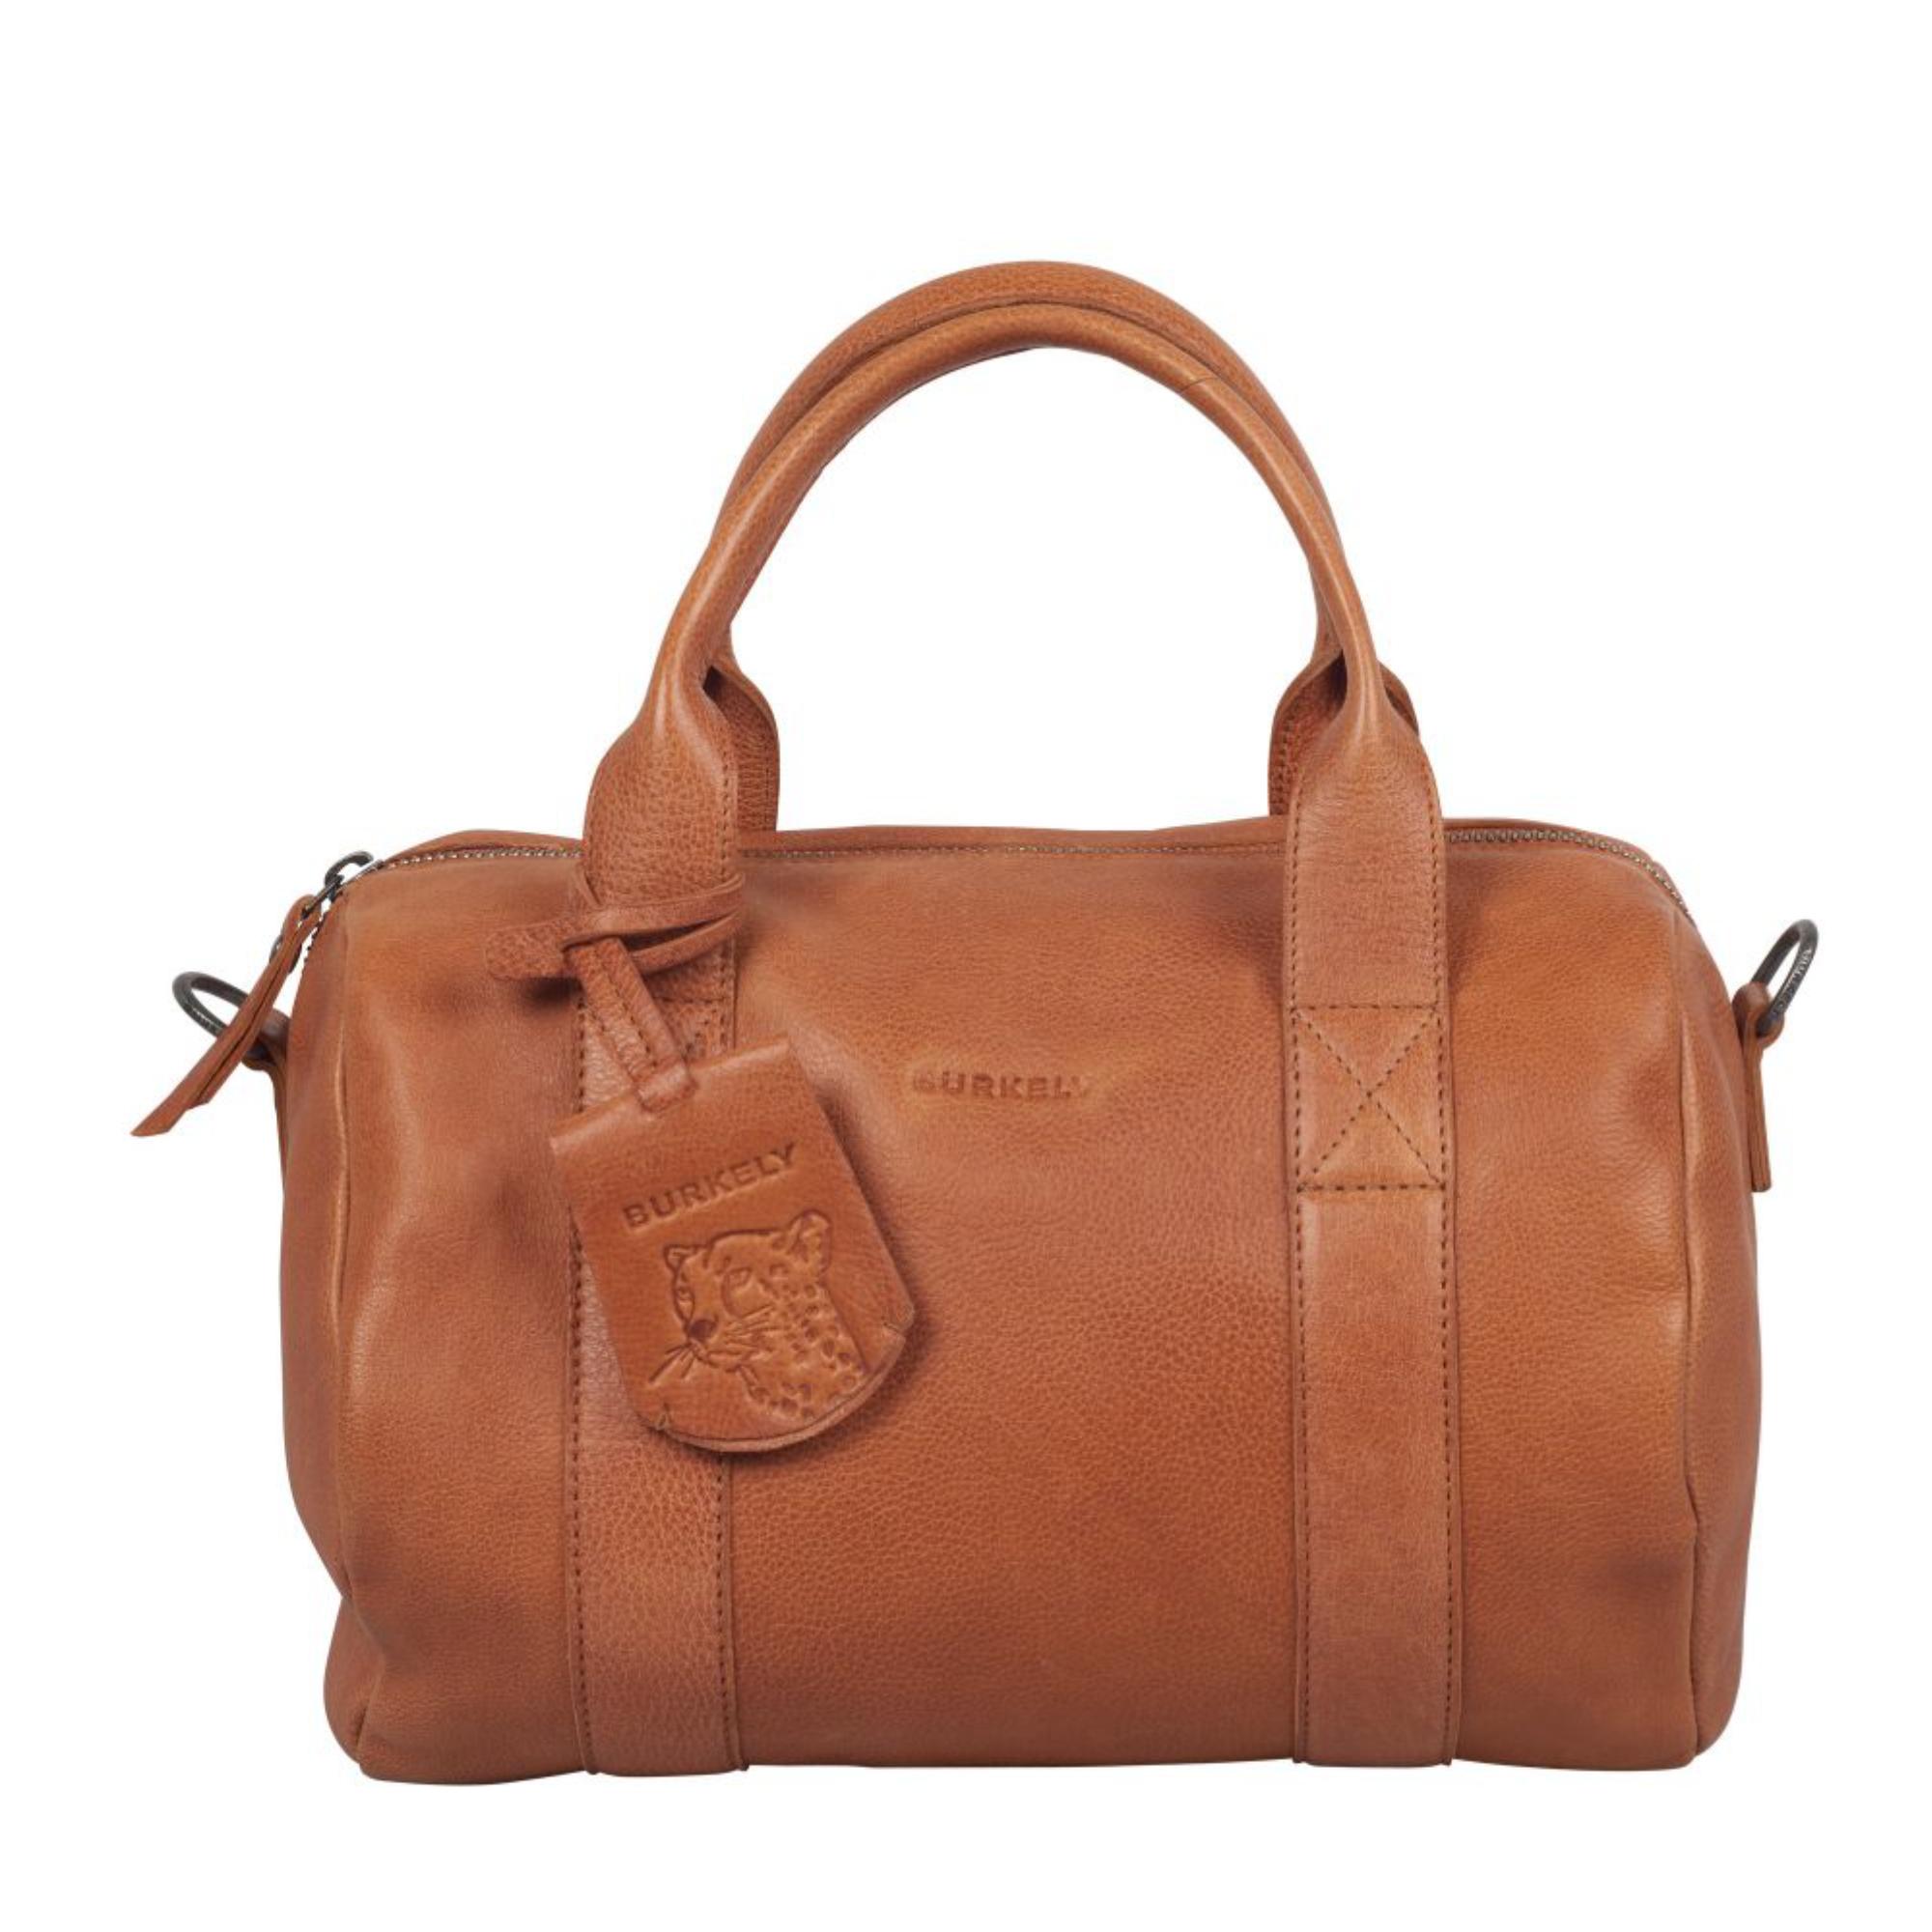 Burkely 1000166 Handbag S 84.24 Cognac